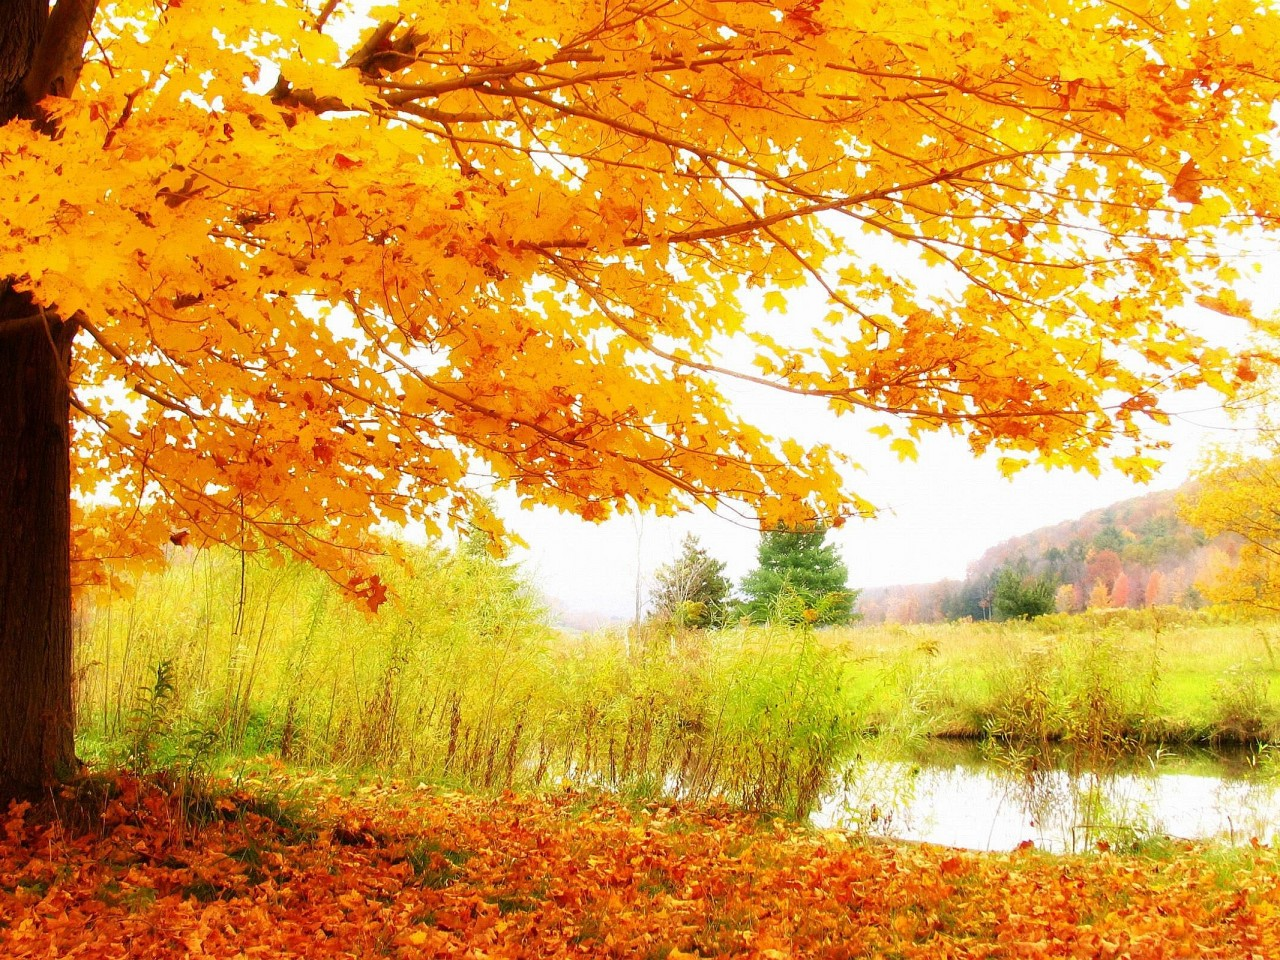 High Resolution Fall Wallpaper: HD Autumn Scenery Wallpaper